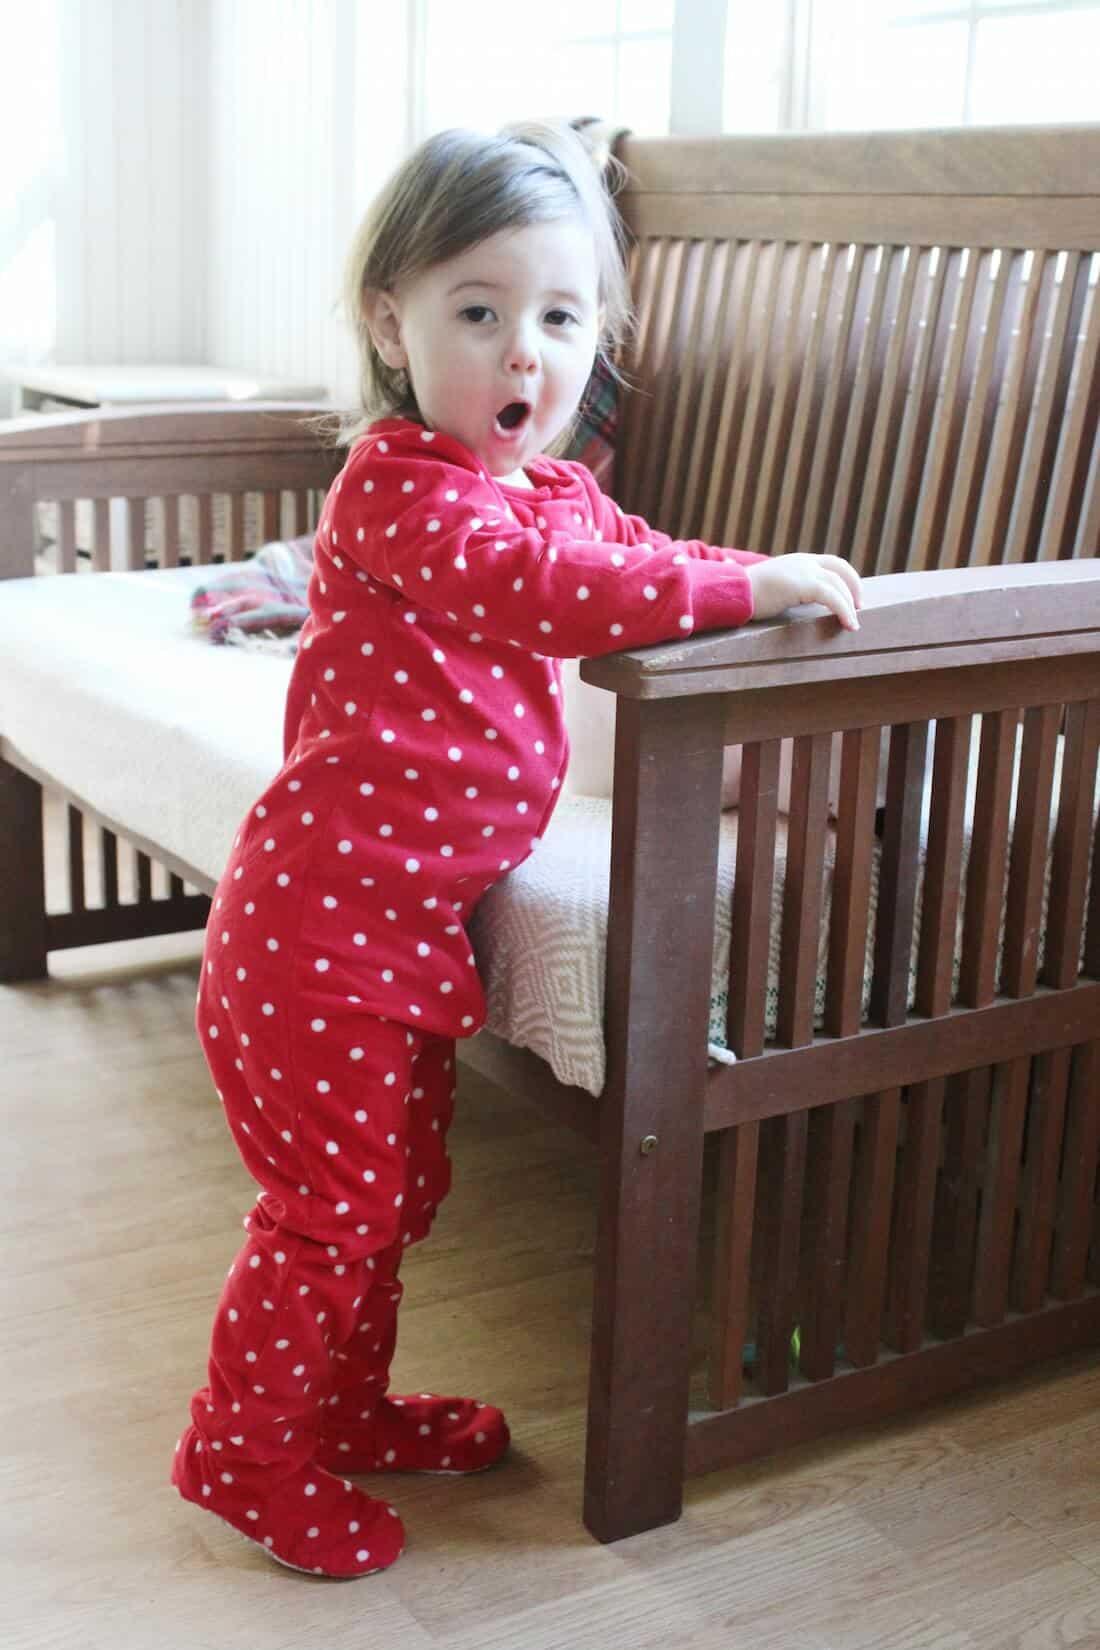 Toddler girl on Christmas morning.